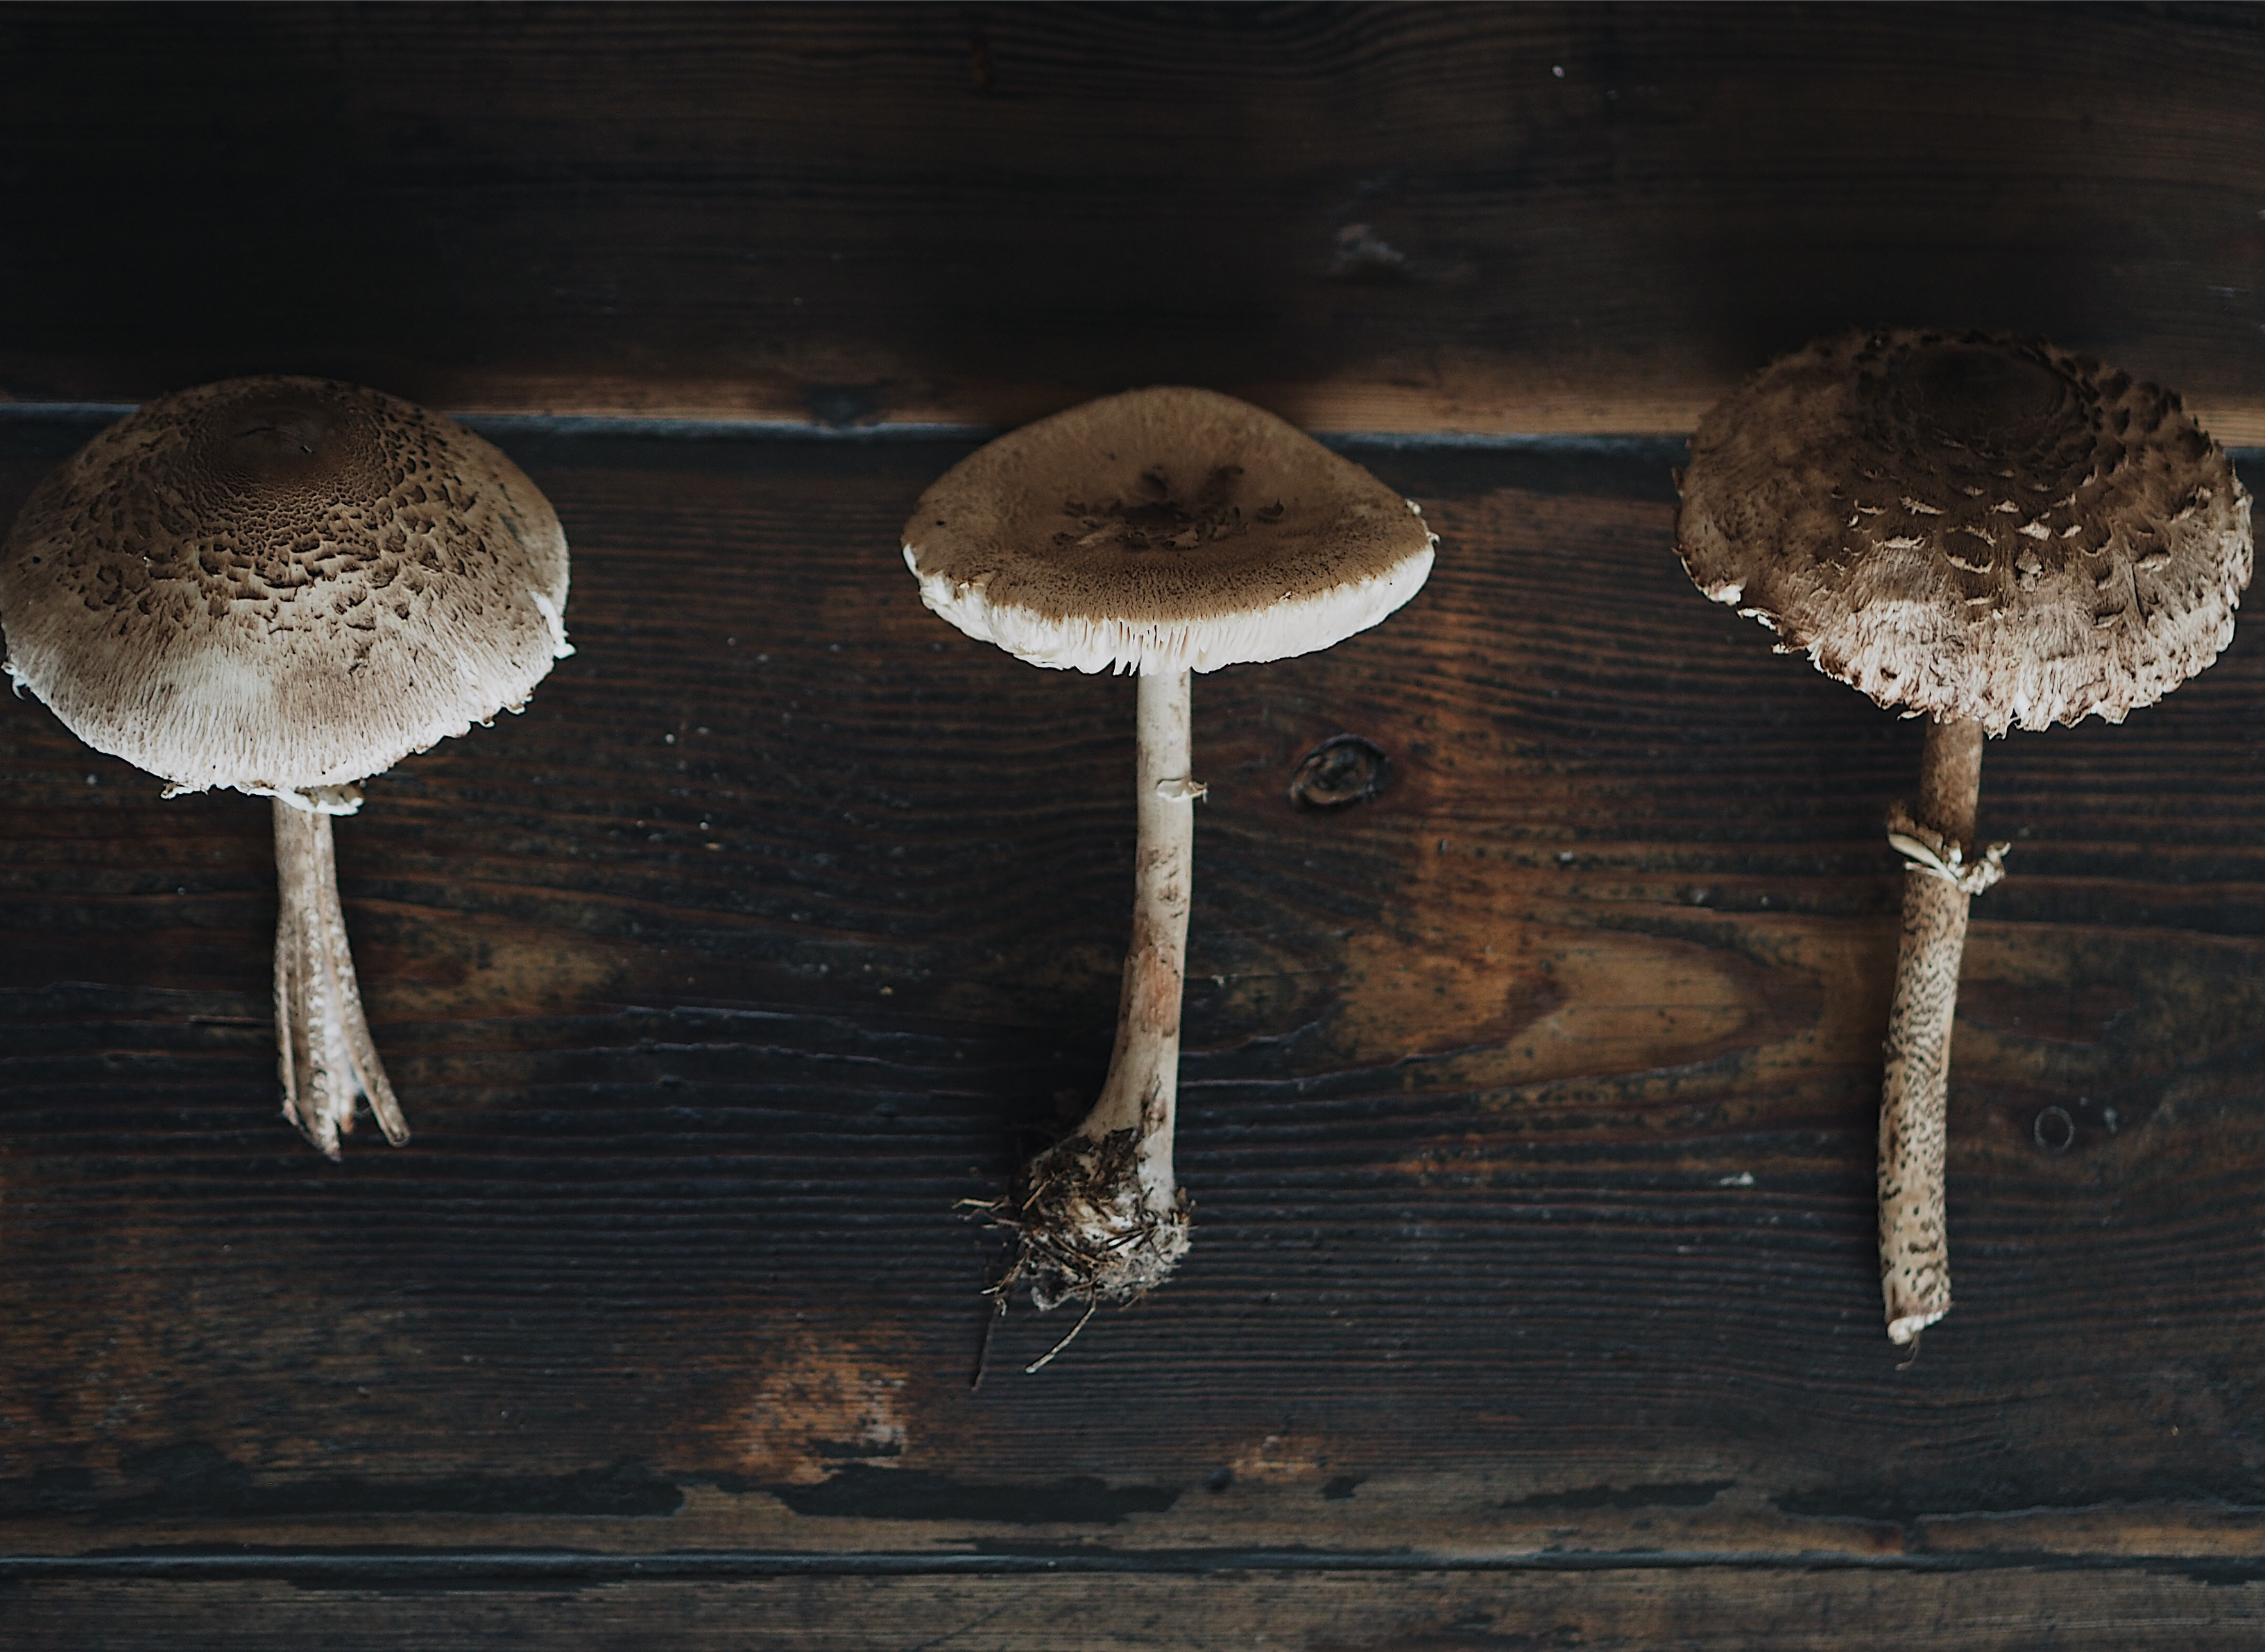 evafedeveka photography vegetarian parasol mushroom recipe homemade slowfood